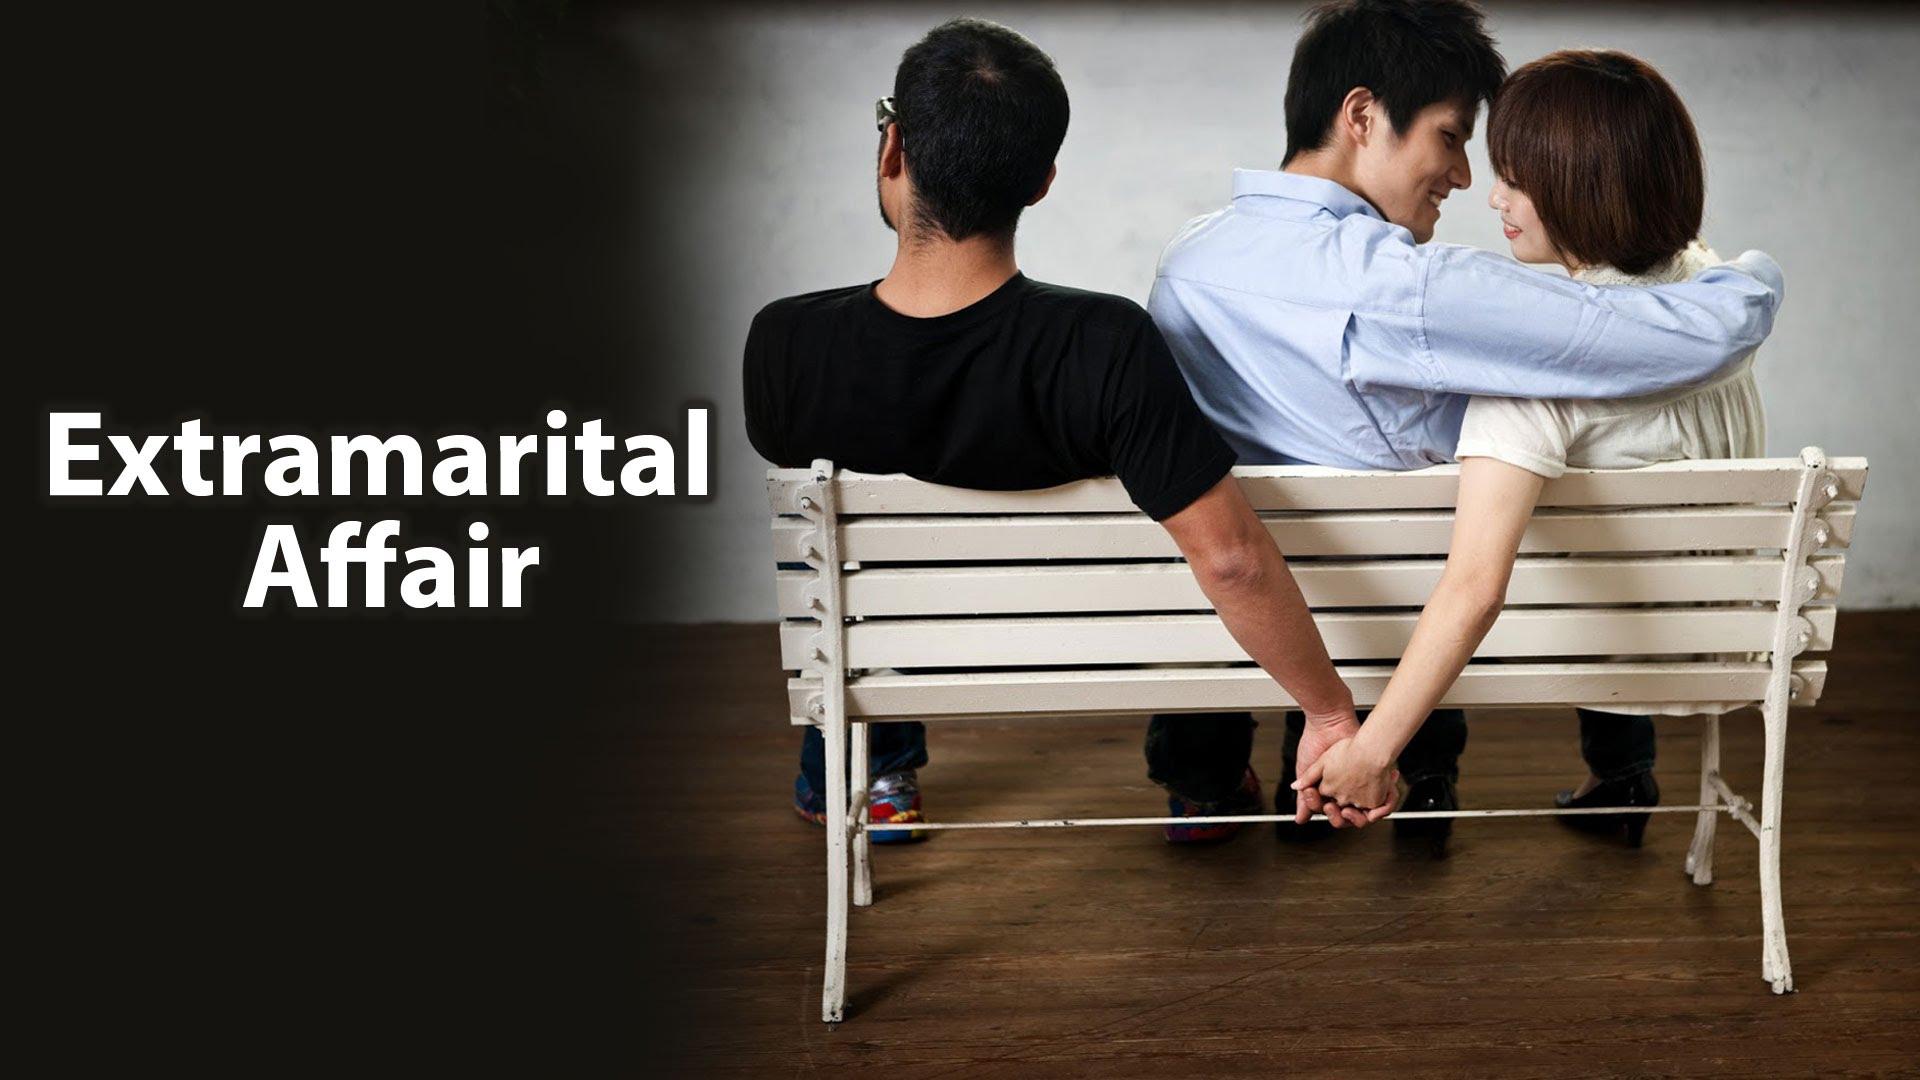 Extramarital affairs